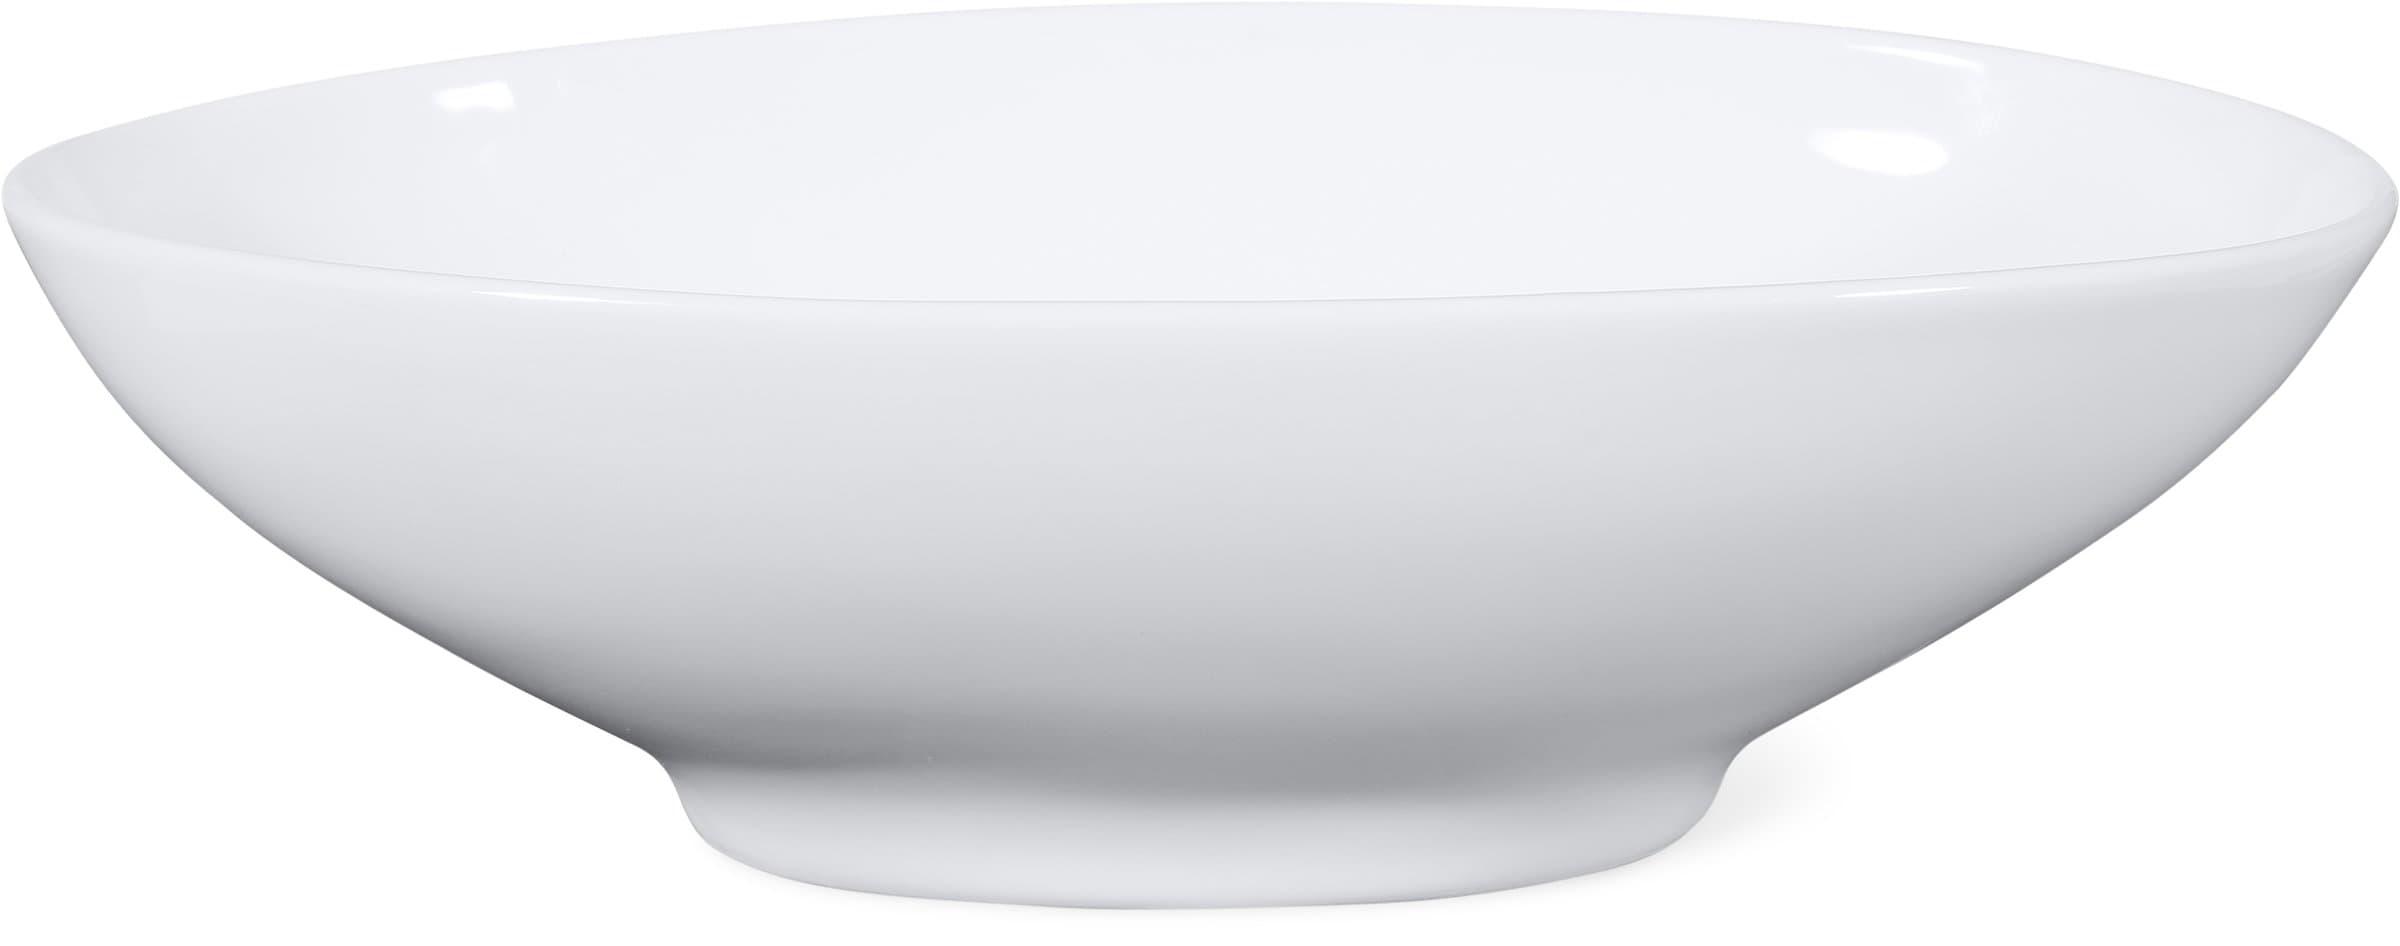 Cucina & Tavola PURE Schüssel 19x11.5cm